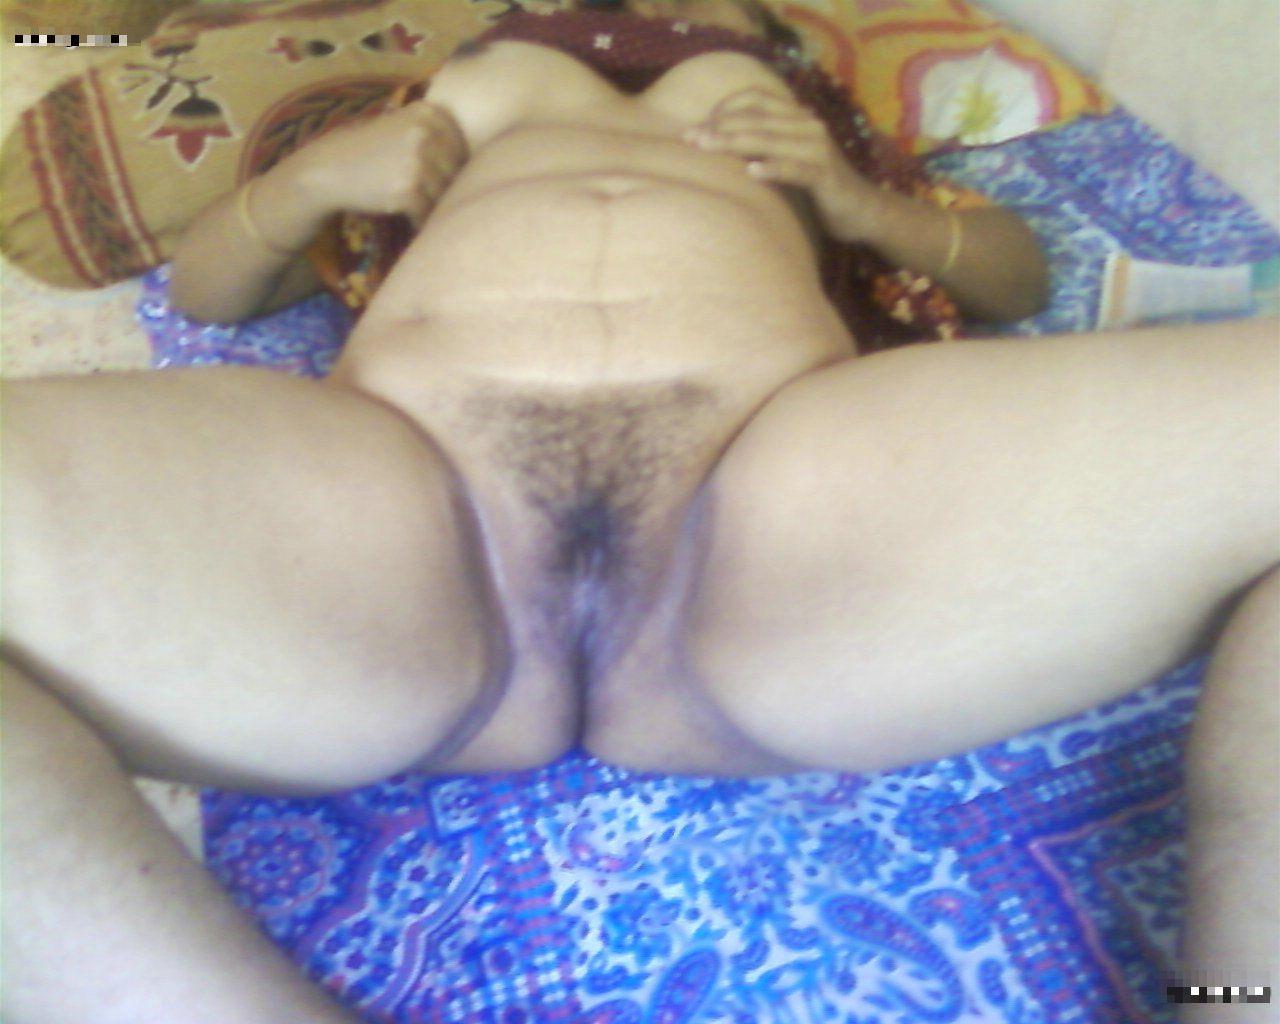 Penis a vagina xxx porno